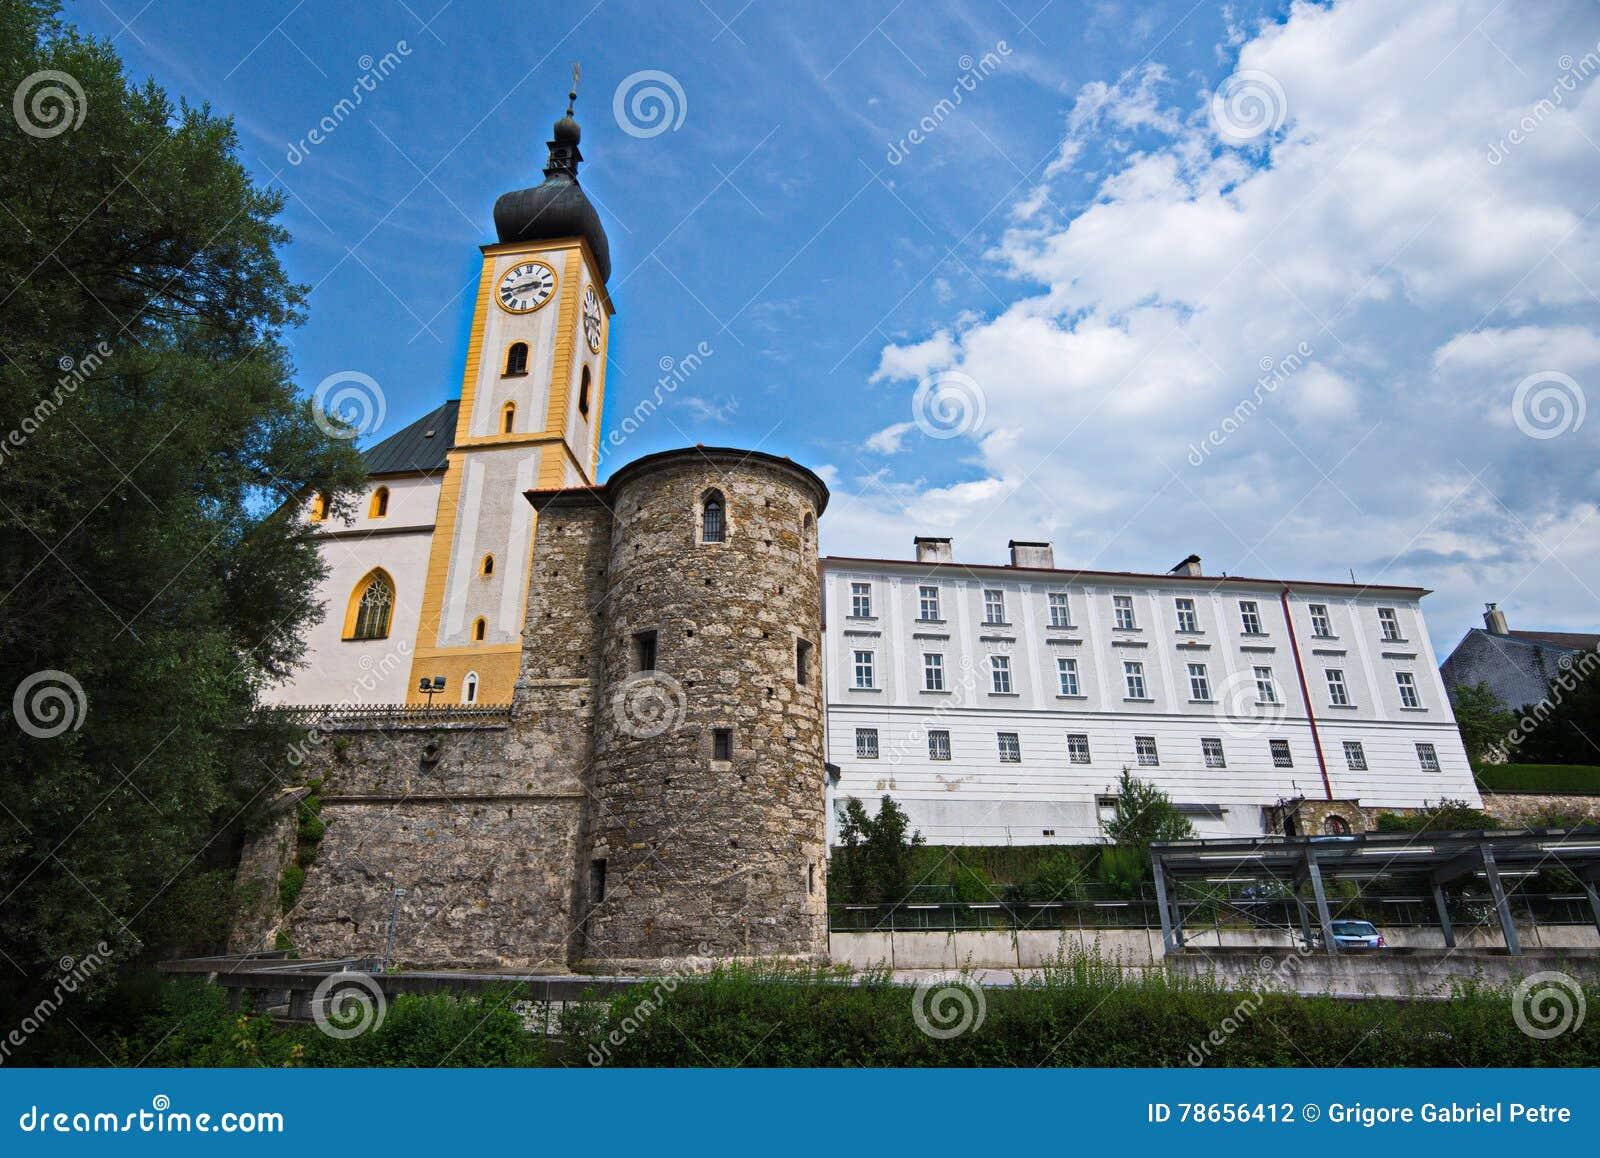 Schloss Rothschild -城堡在奥地利